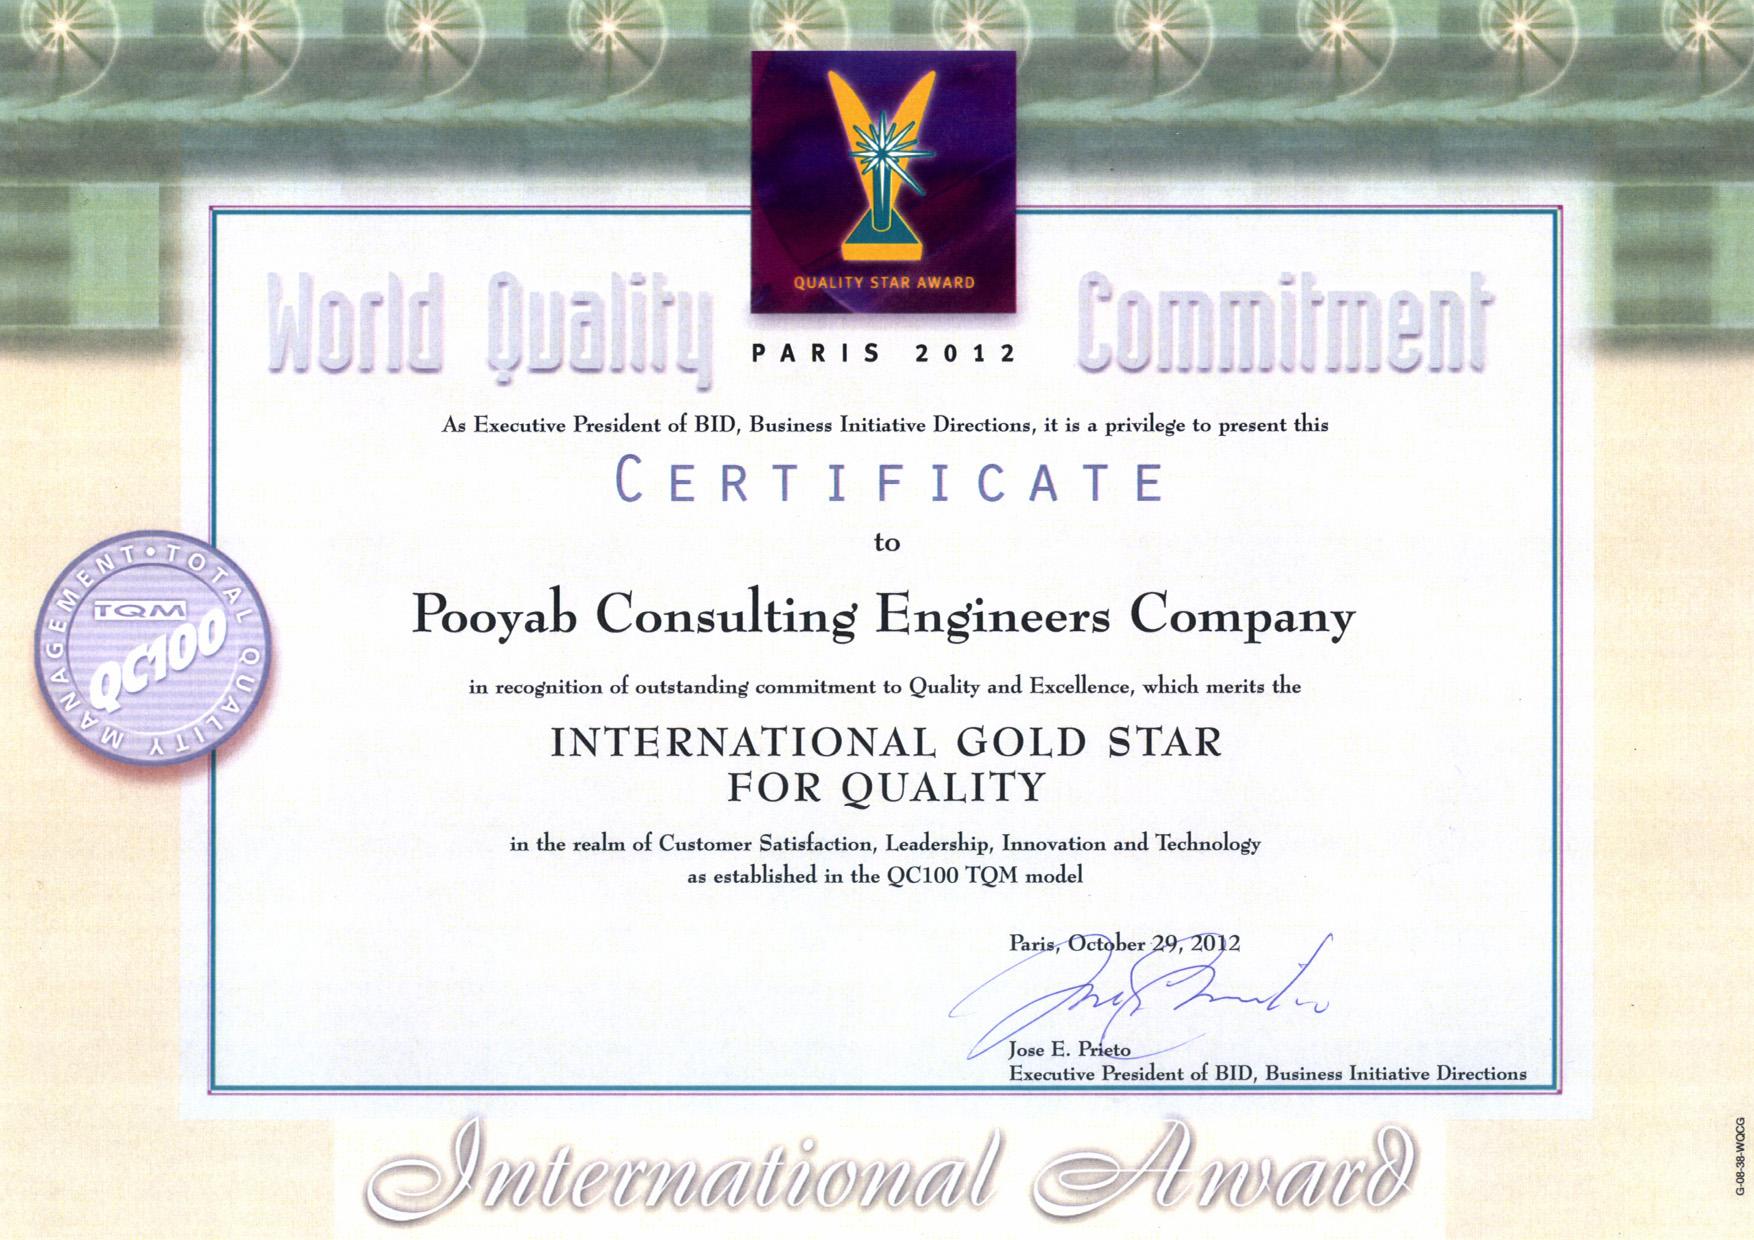 CRTF-WorldQualityCommitment-Pooyab